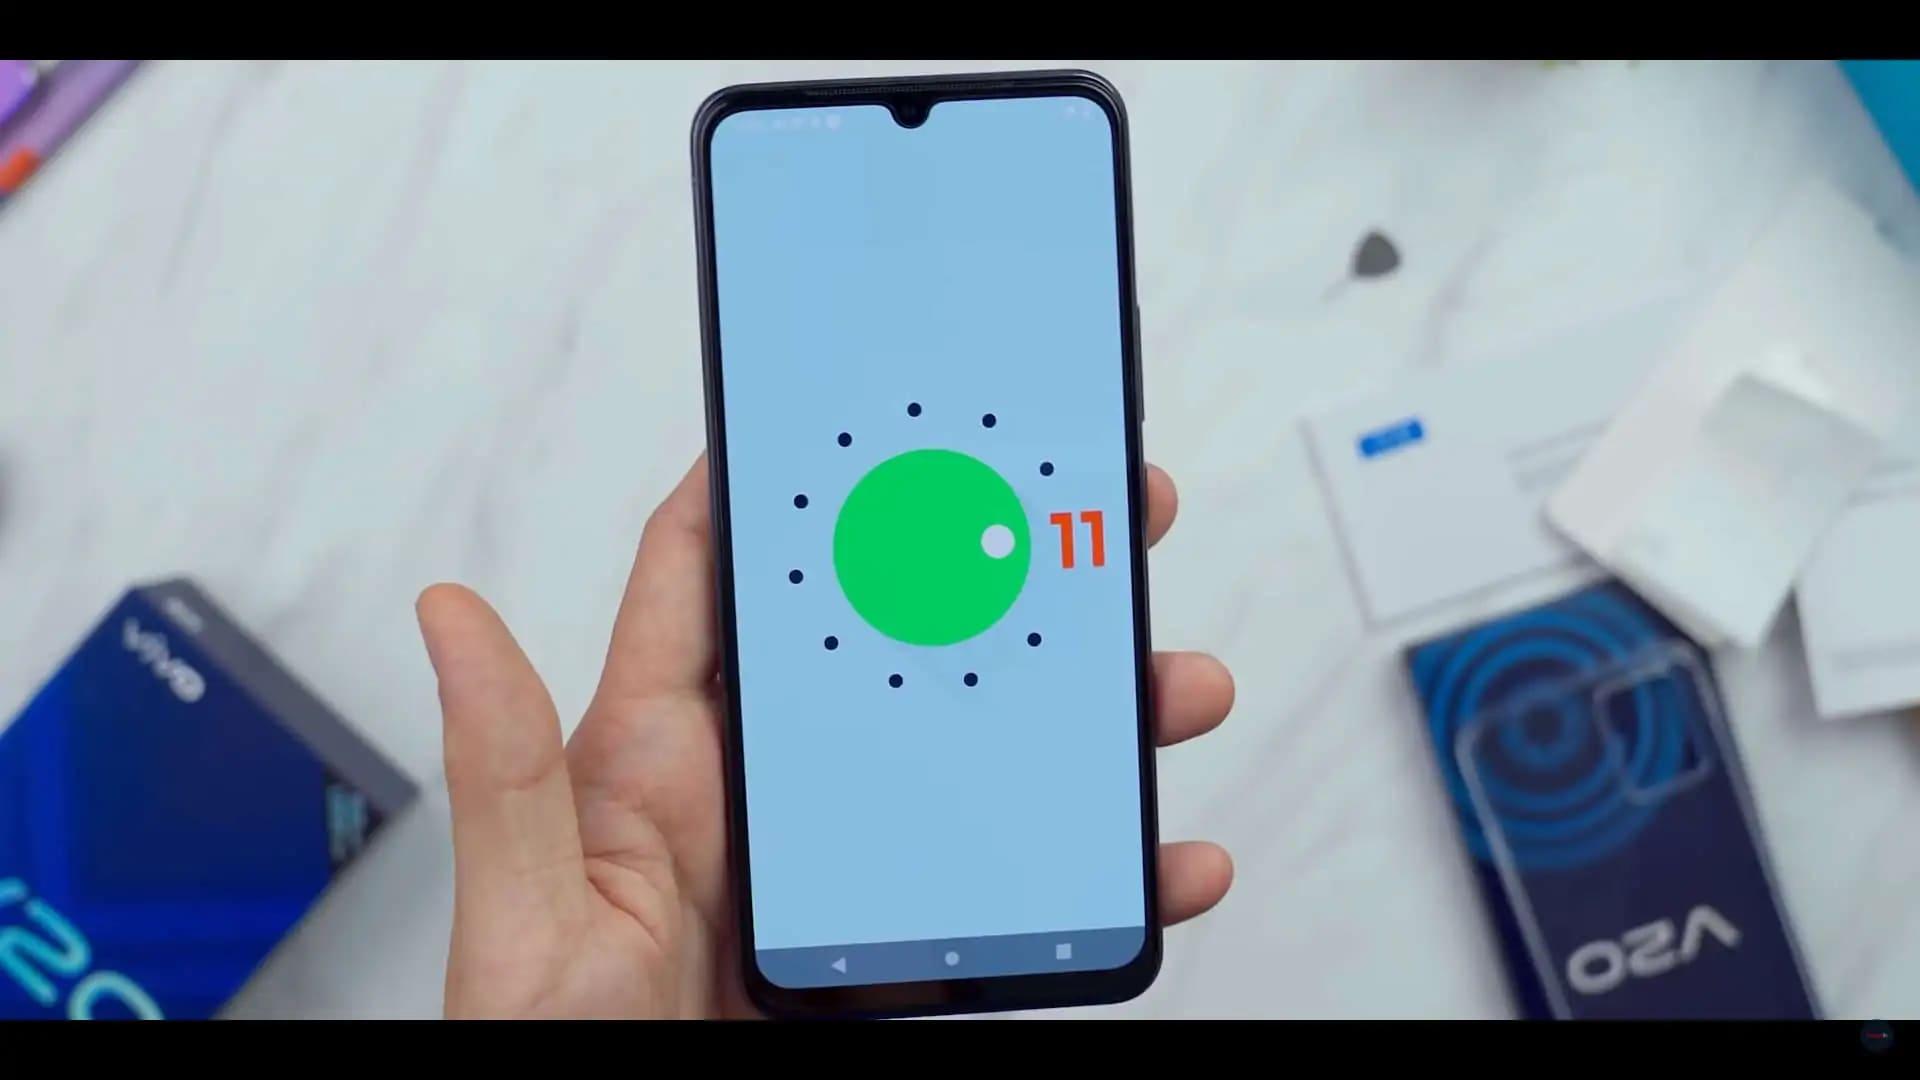 Vivo V20 got Android 11 faster than Google smartphones